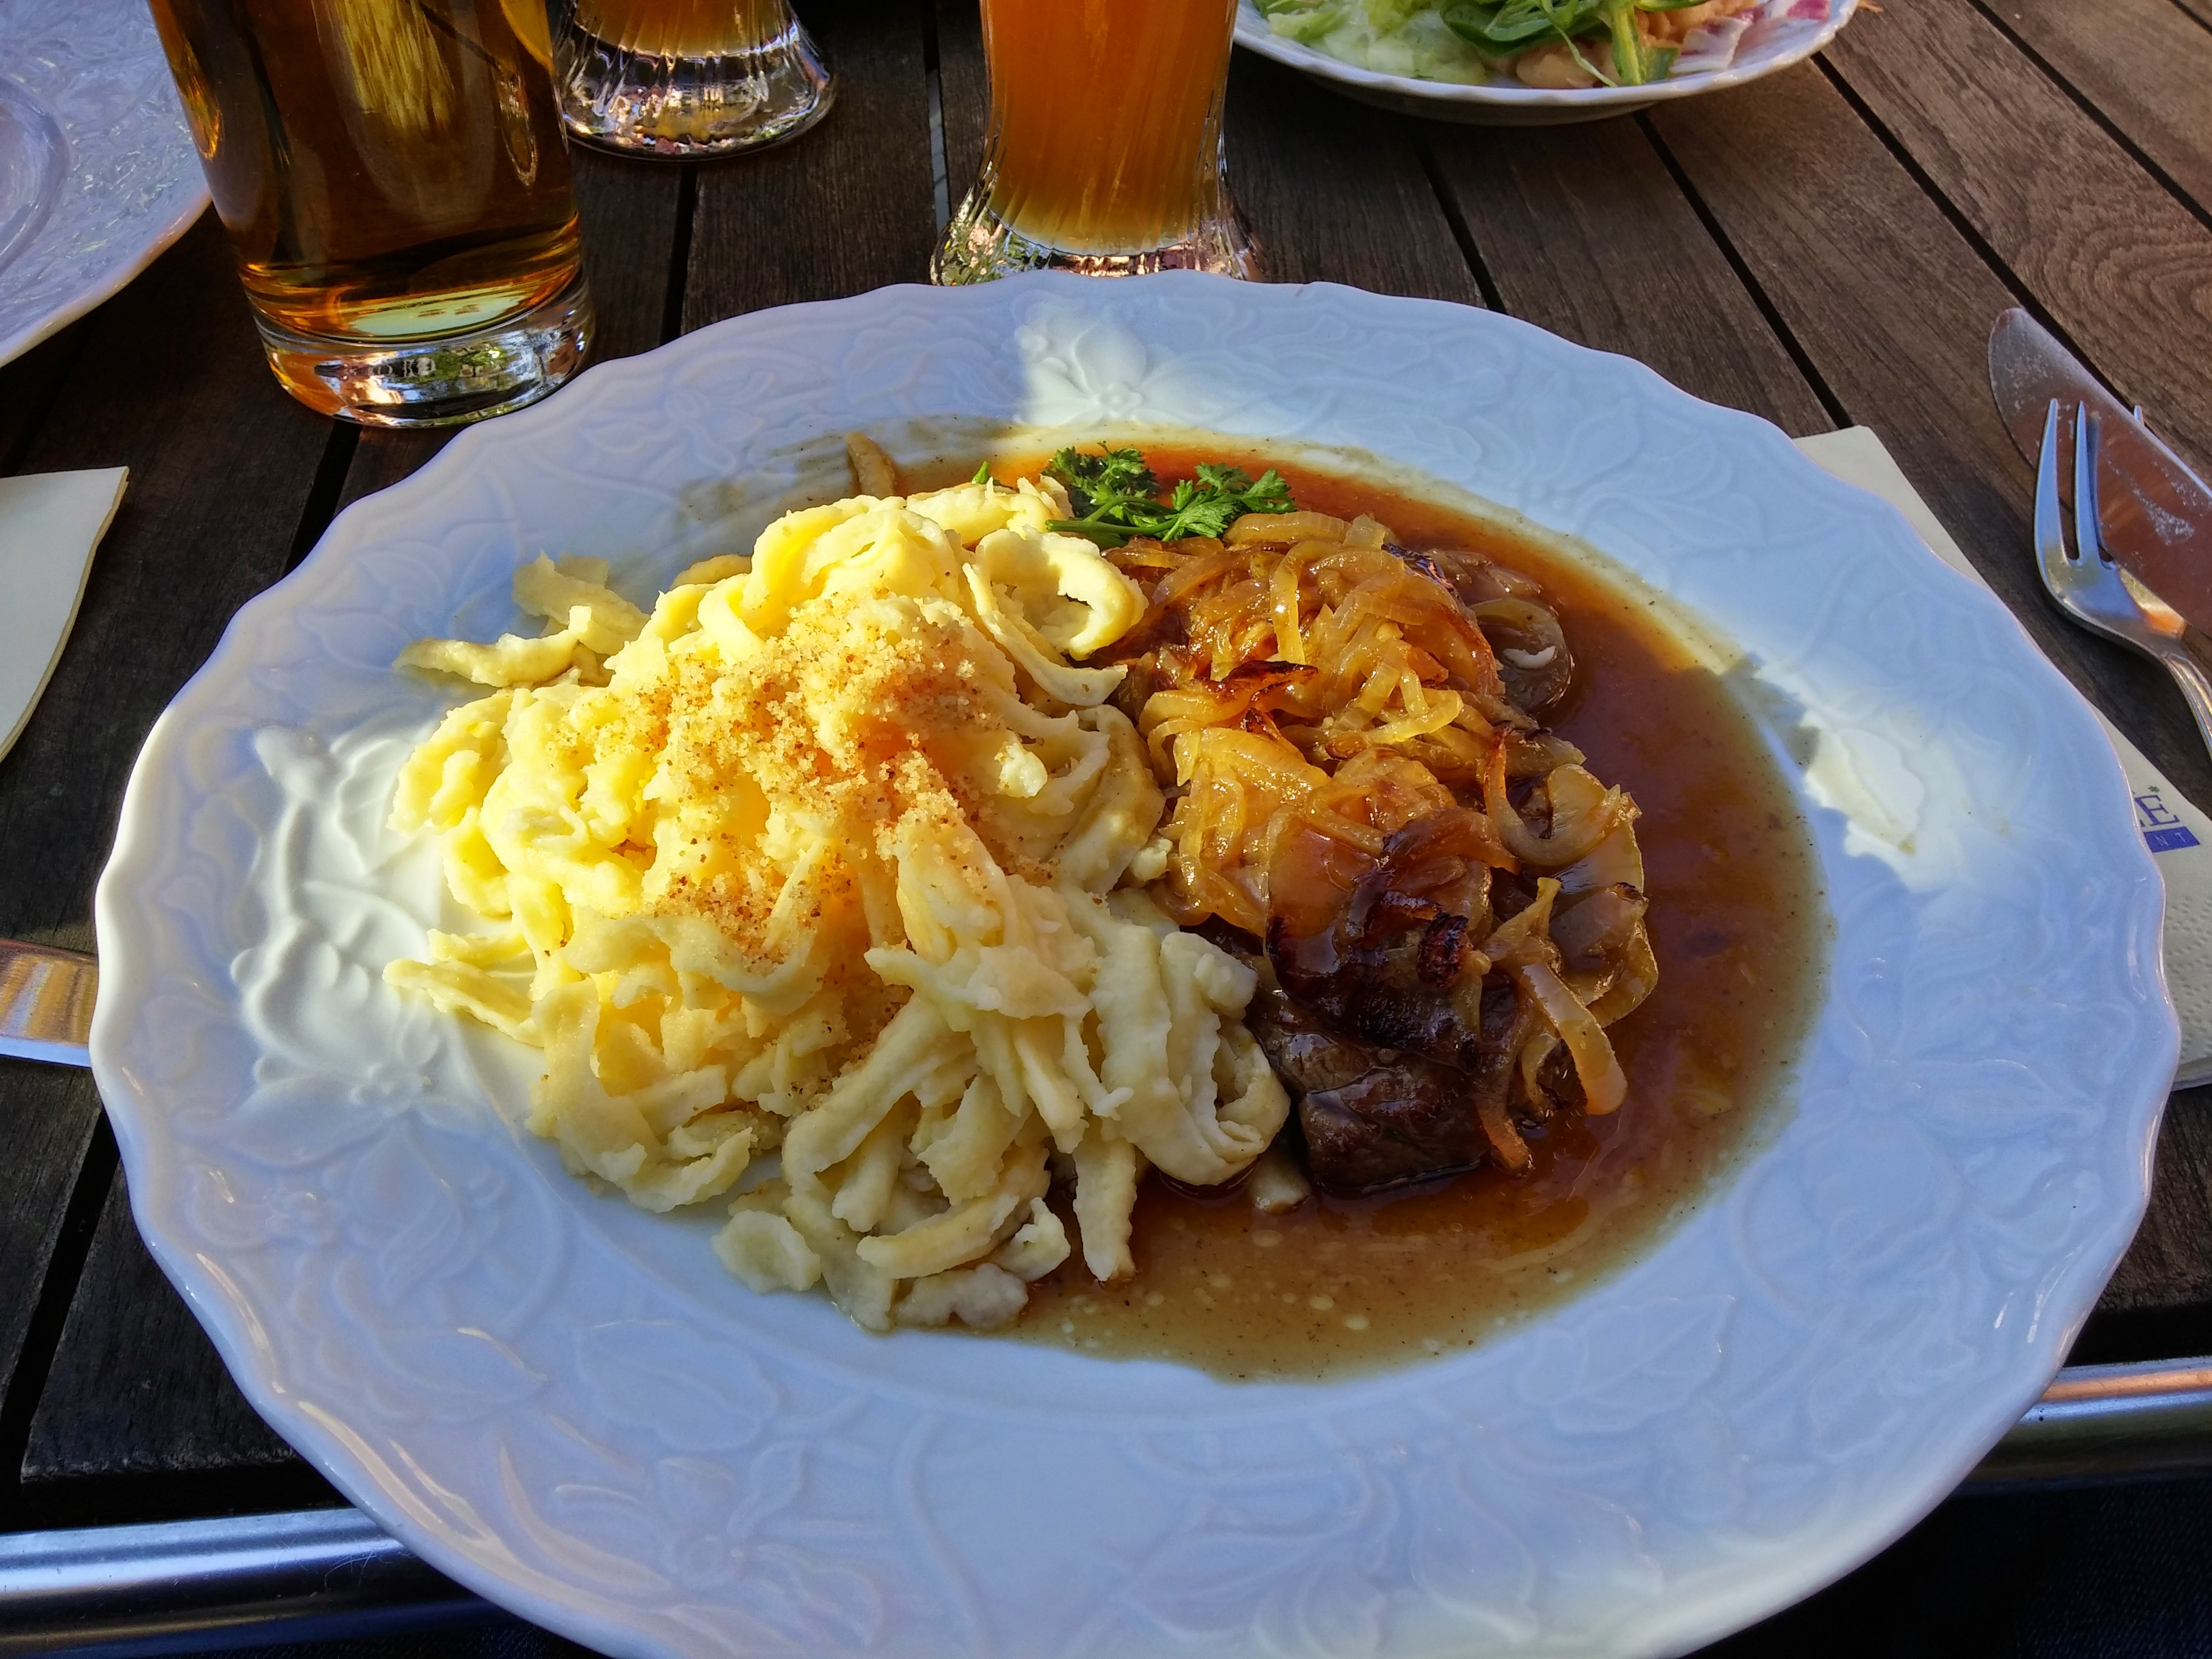 https://foodloader.net/nico_2014-10-18_zwiebelrostbraten-mit-spaetzle.jpg